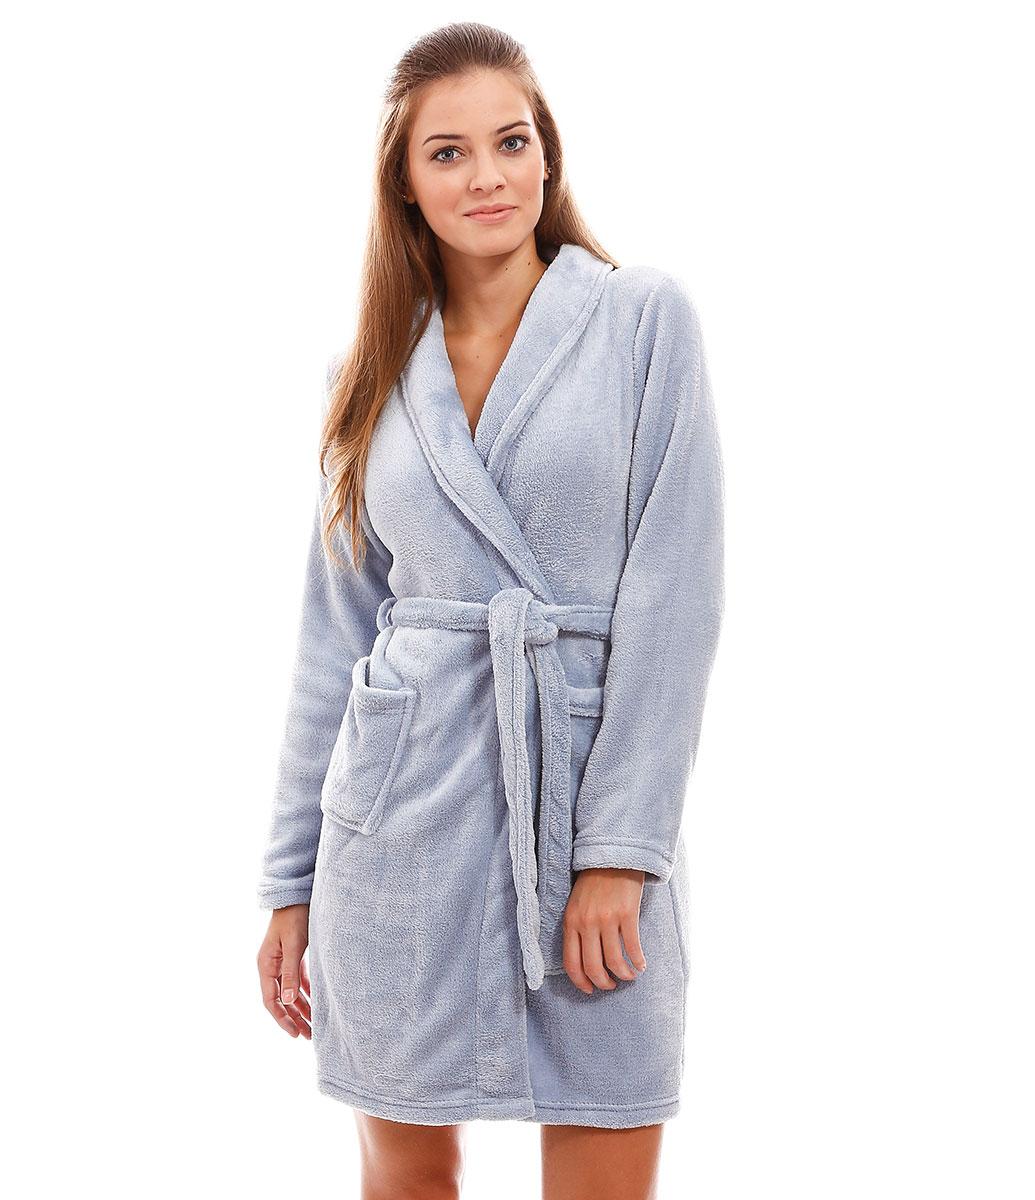 robe-azul-simples